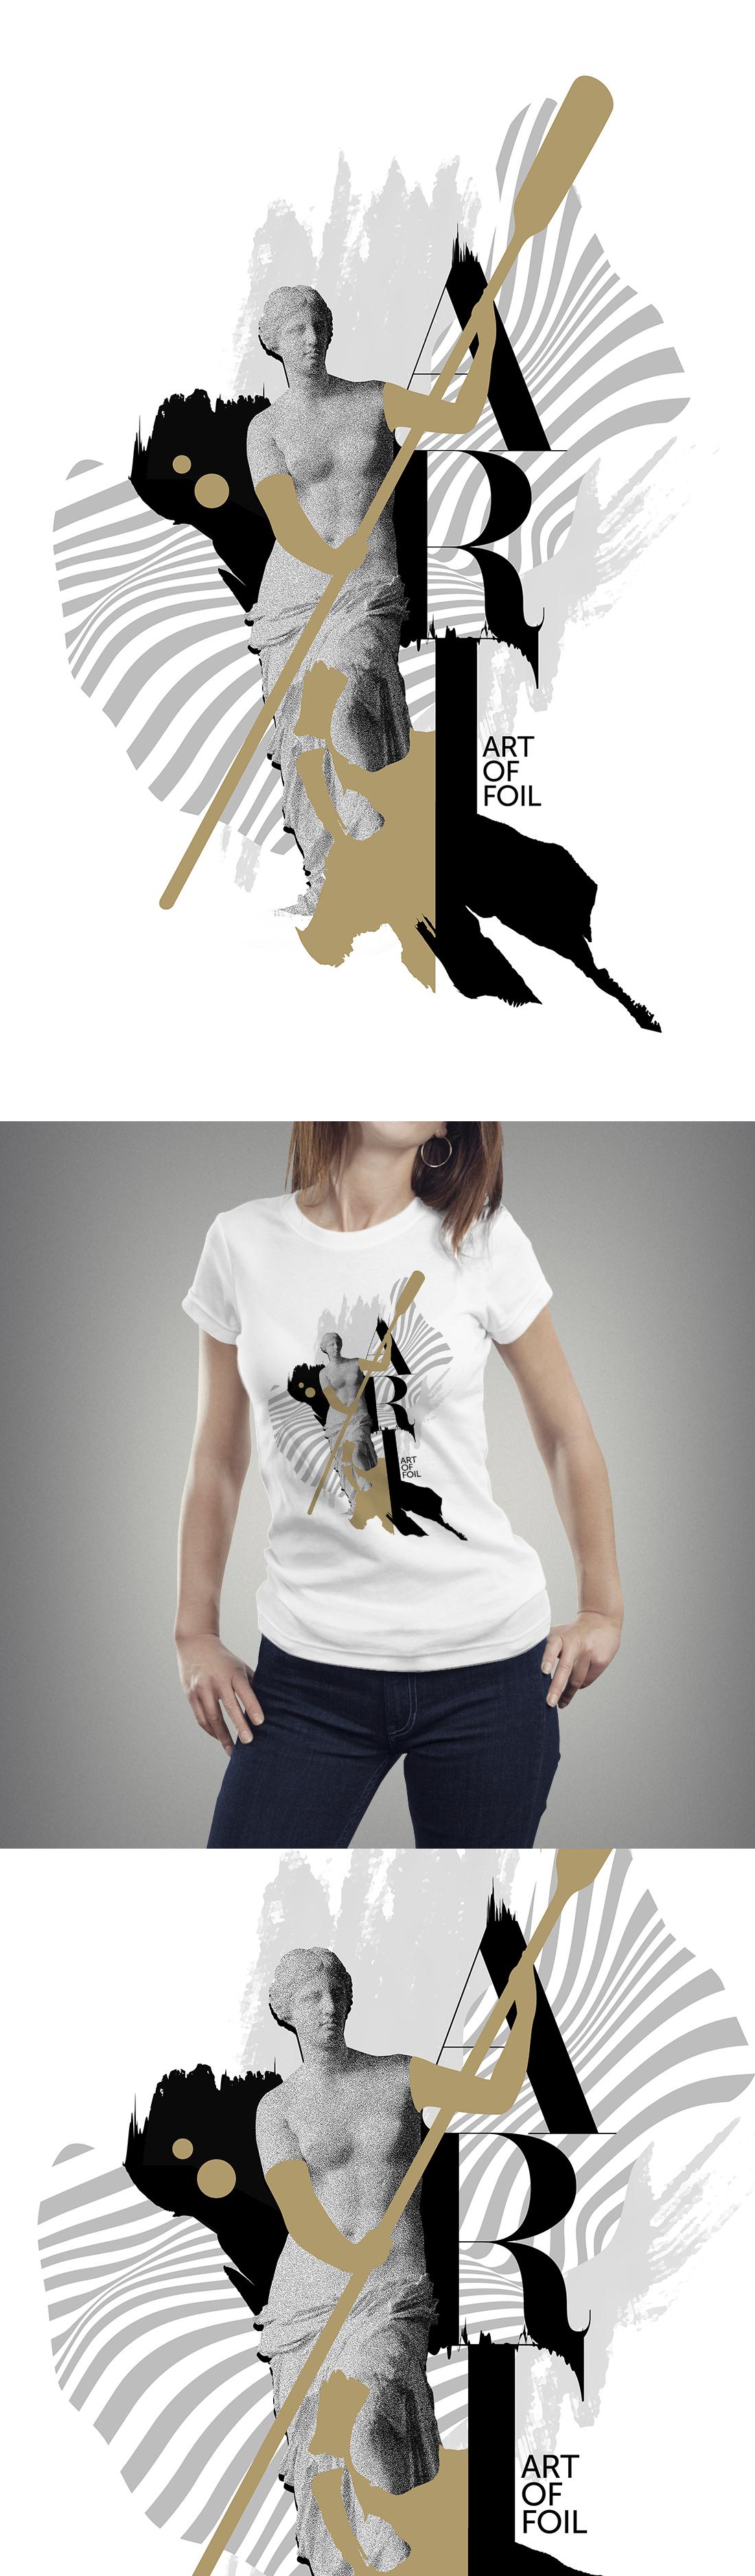 Разработать принт для футболки фото f_6765f5f8b7d2b91a.jpg